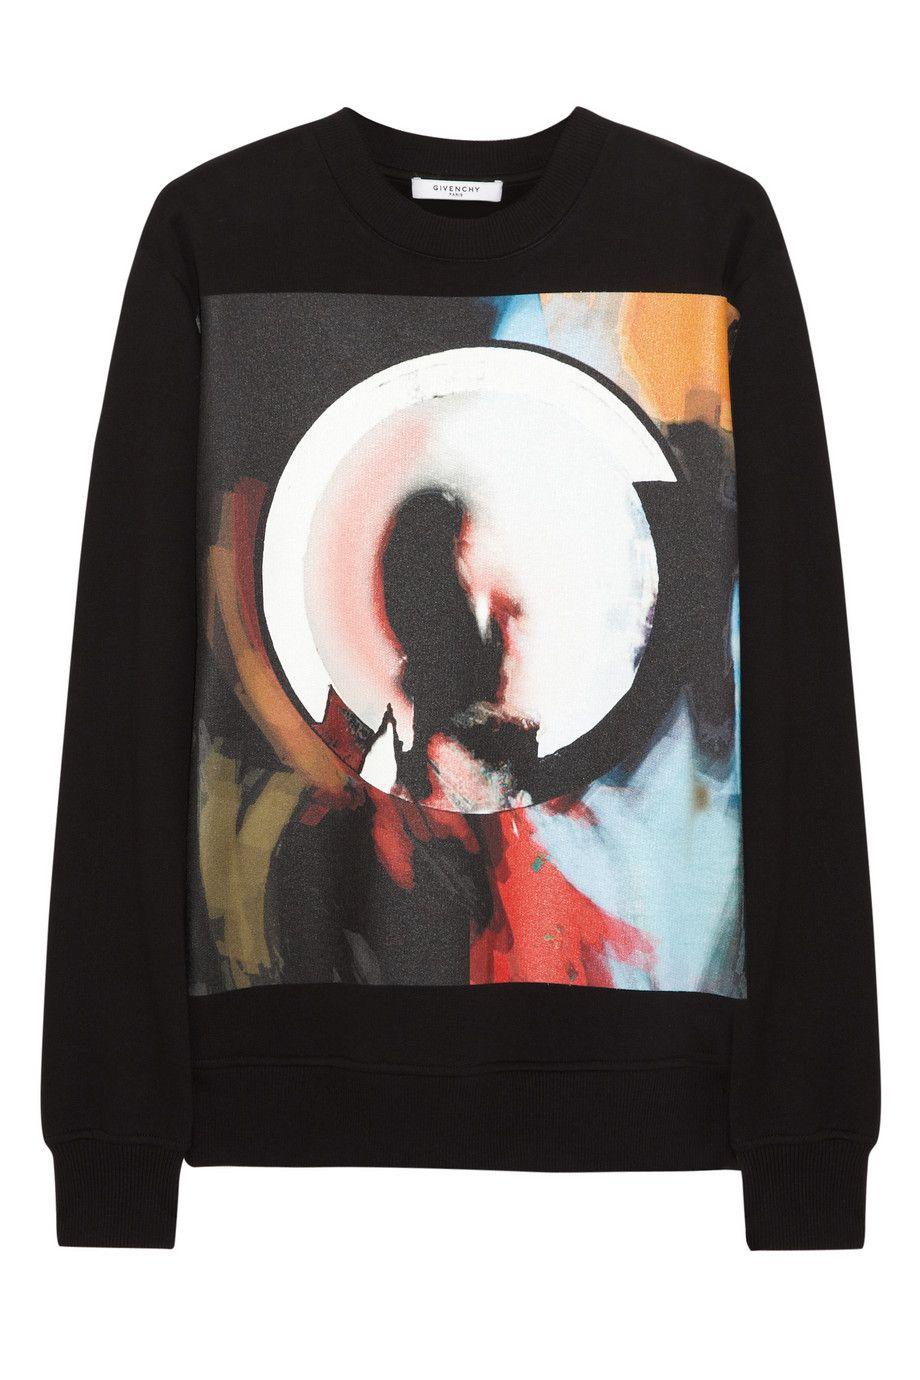 Givenchy Madonna Halo printed cotton-jersey sweatshirt NET-A-PORTER.COM